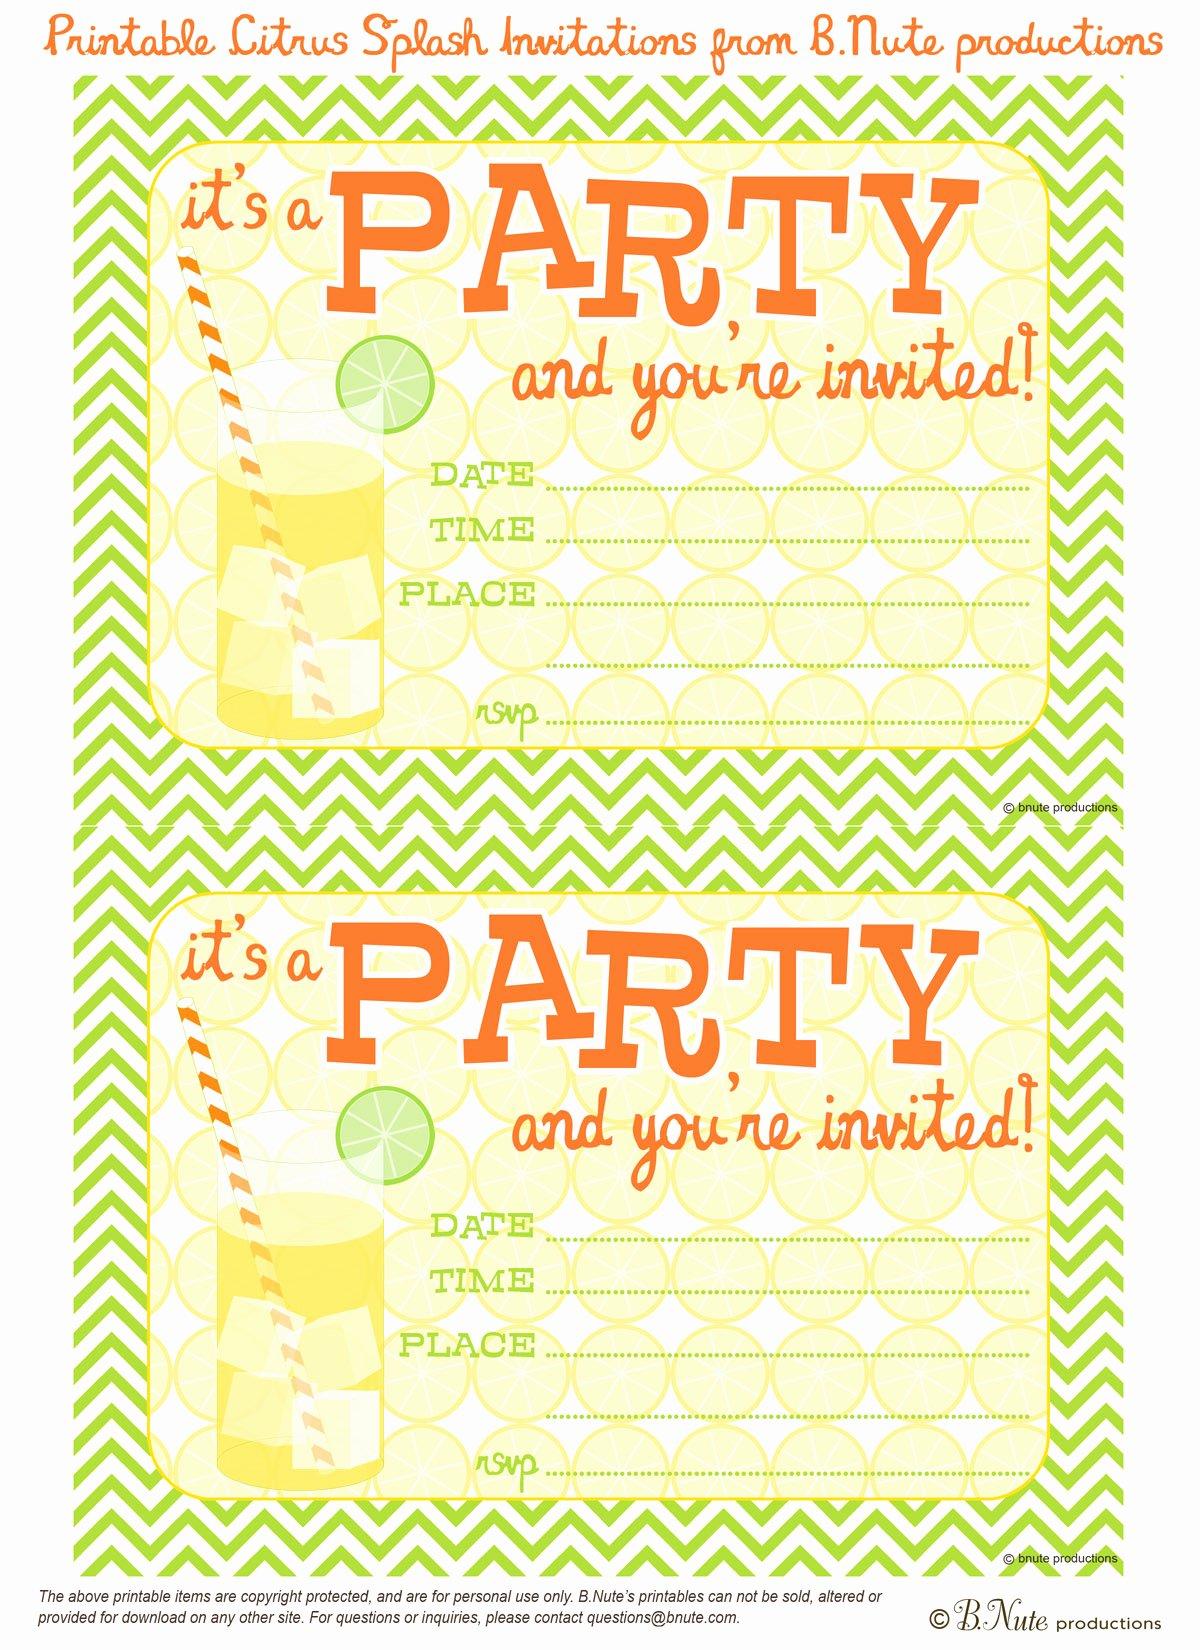 Printable Invitations for Free Unique Bnute Productions Free Printable Citrus Splash Invitations